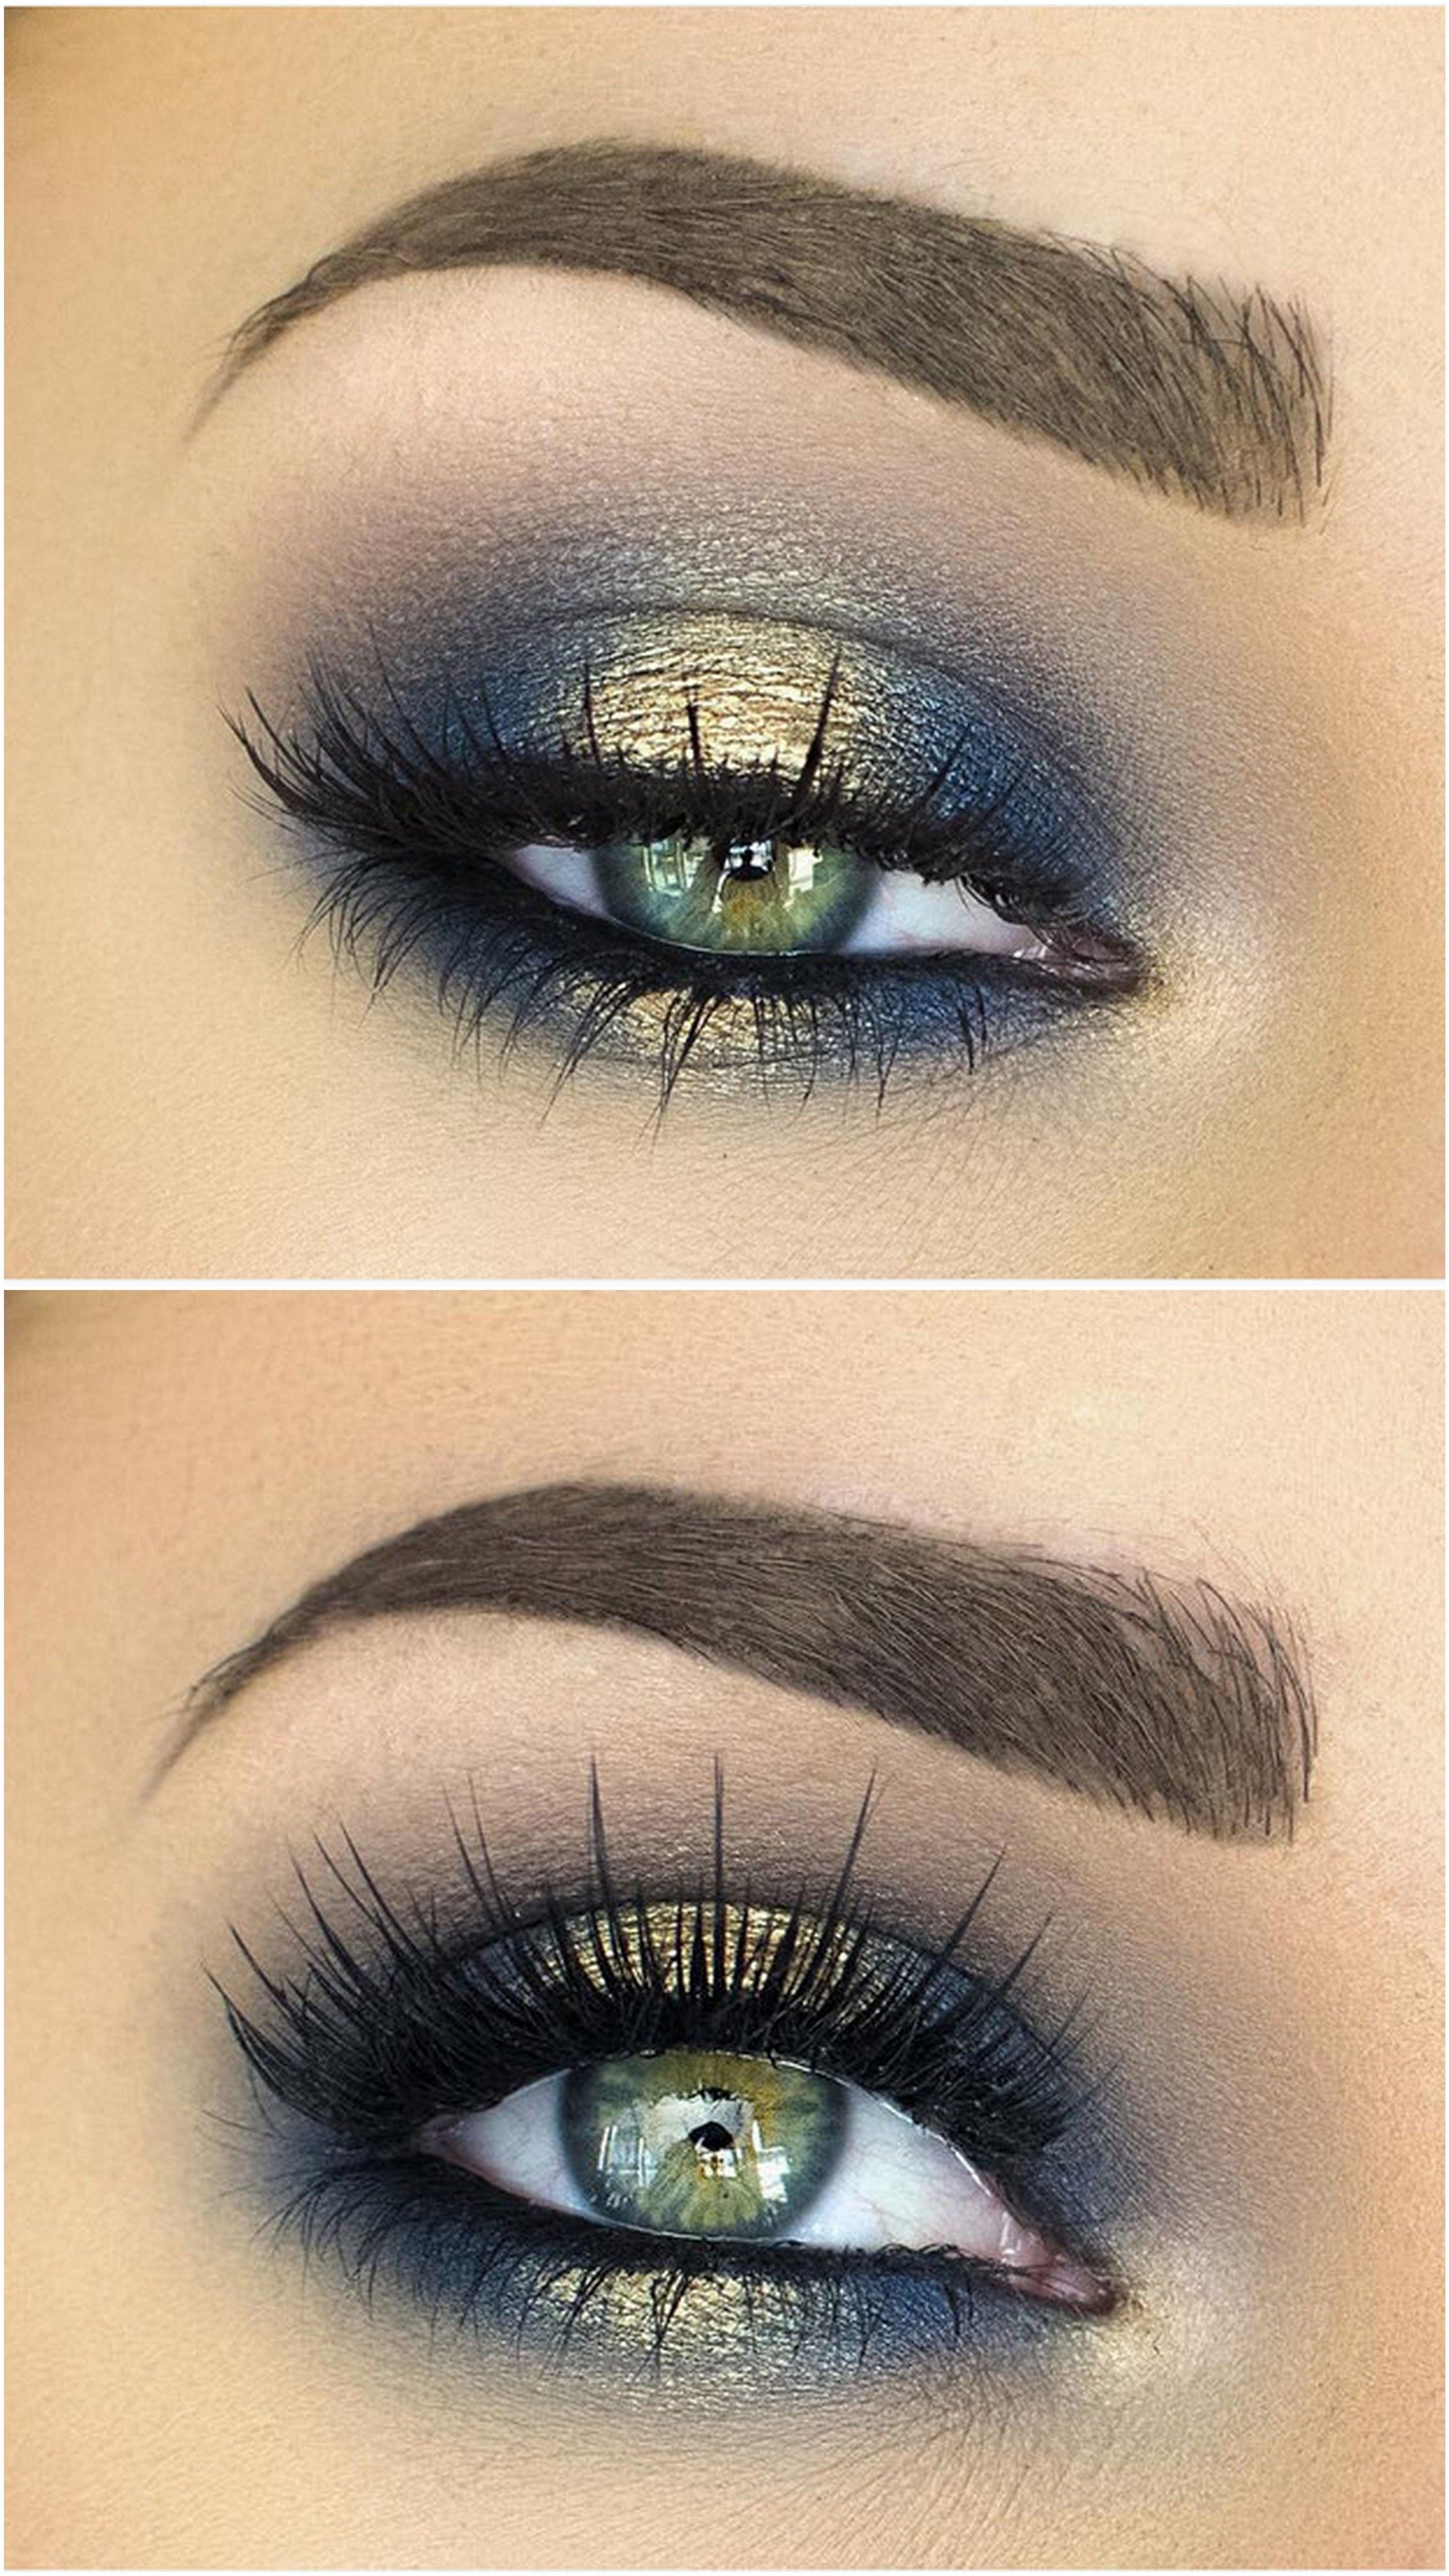 10 Nice Eyeshadow Ideas For Green Eyes spotlight halo smokey eye in navy blue gold makeup